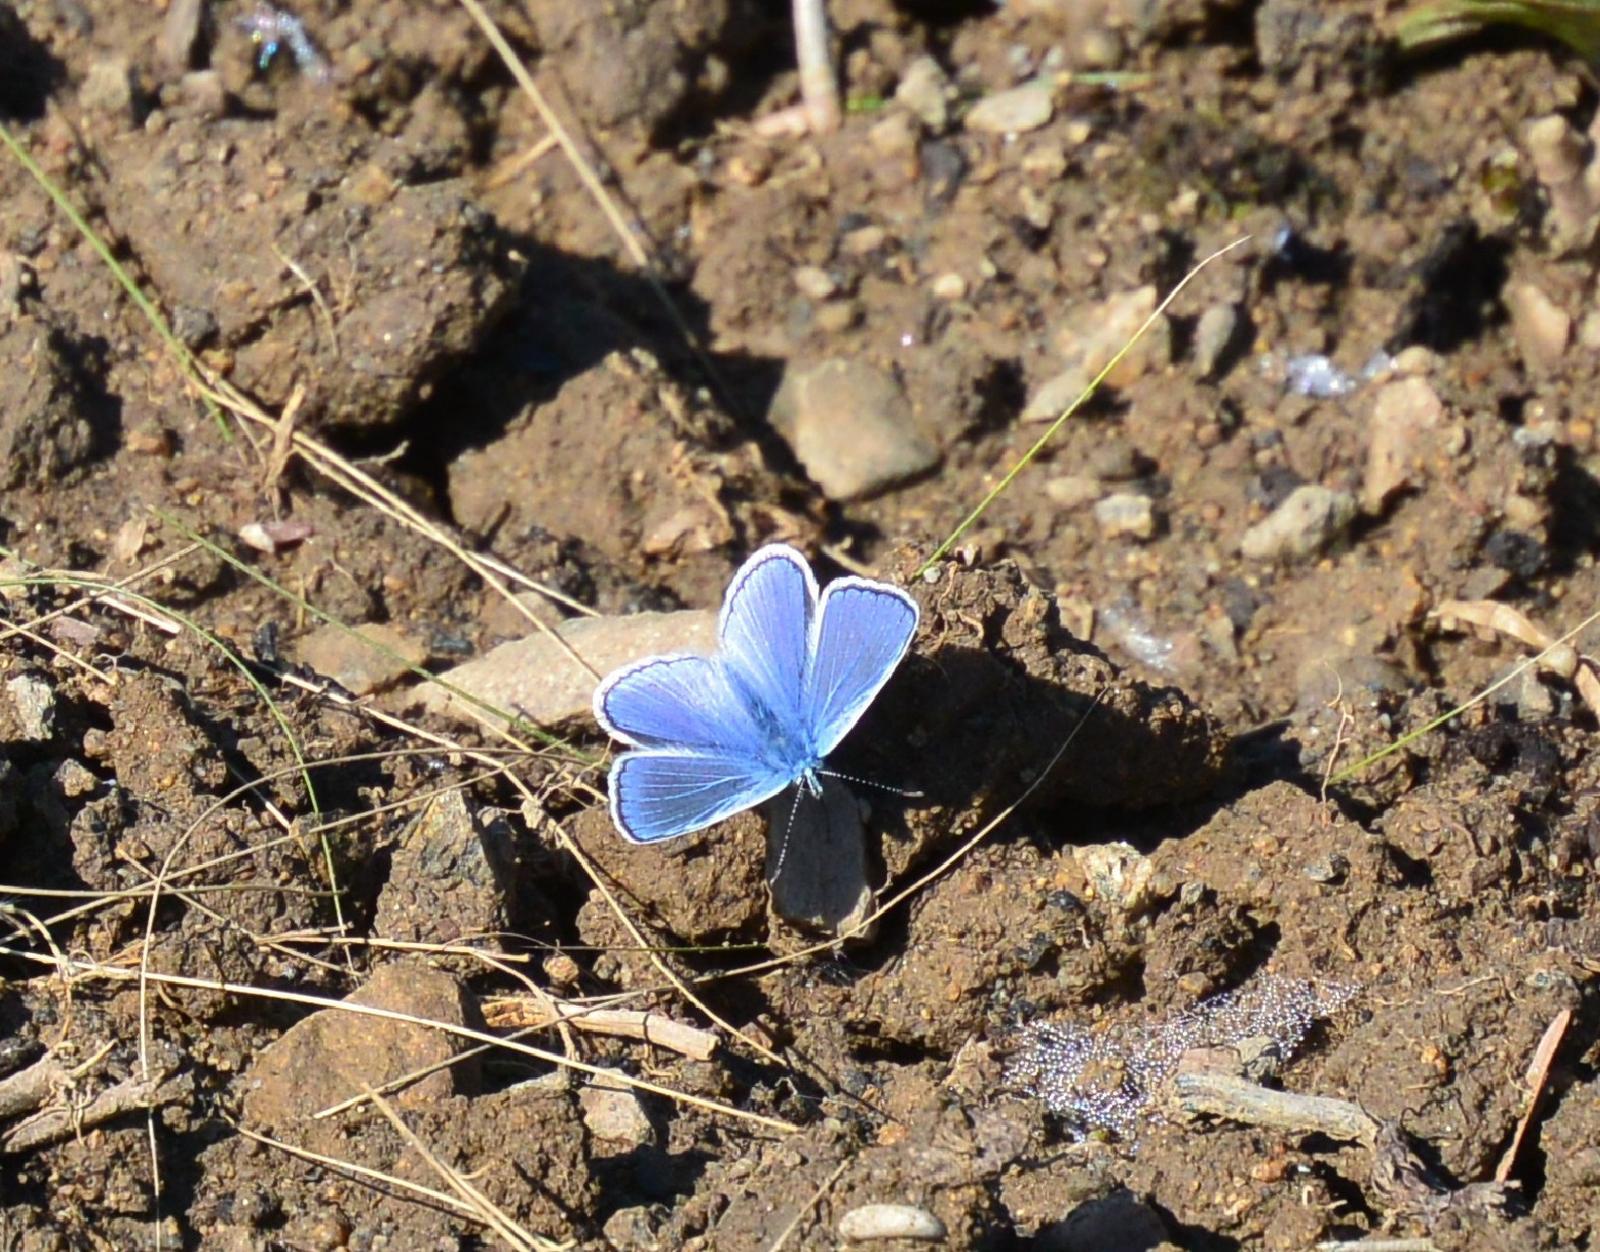 Motýlí zahrada 2019-2020 - Obrázek č. 173